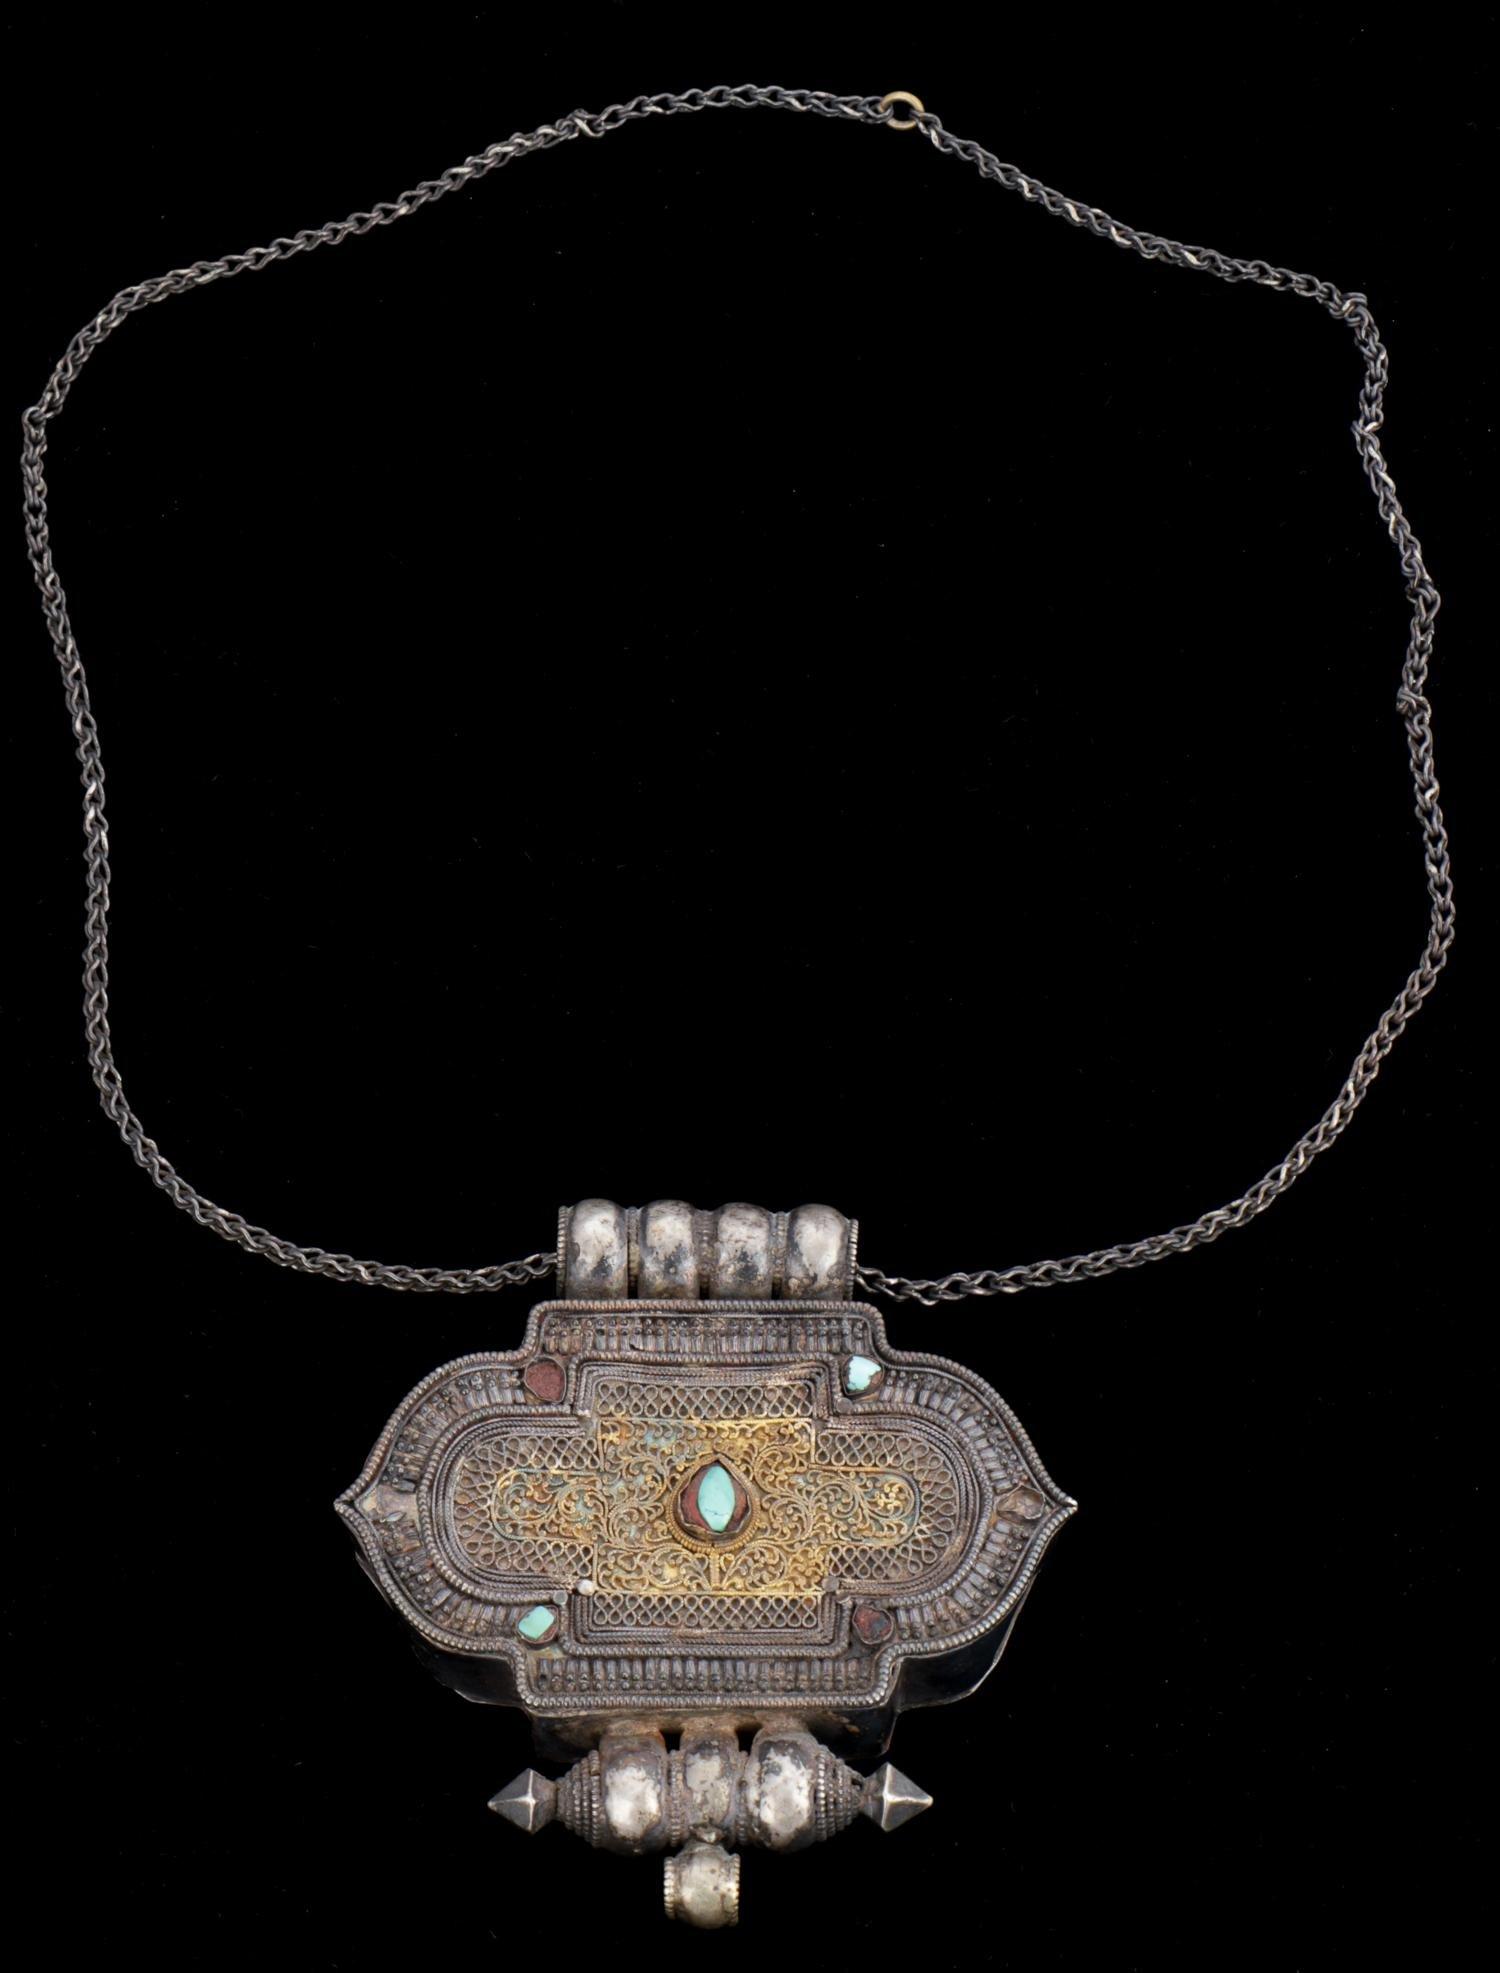 Antique Tibetan Gau/Prayer Box